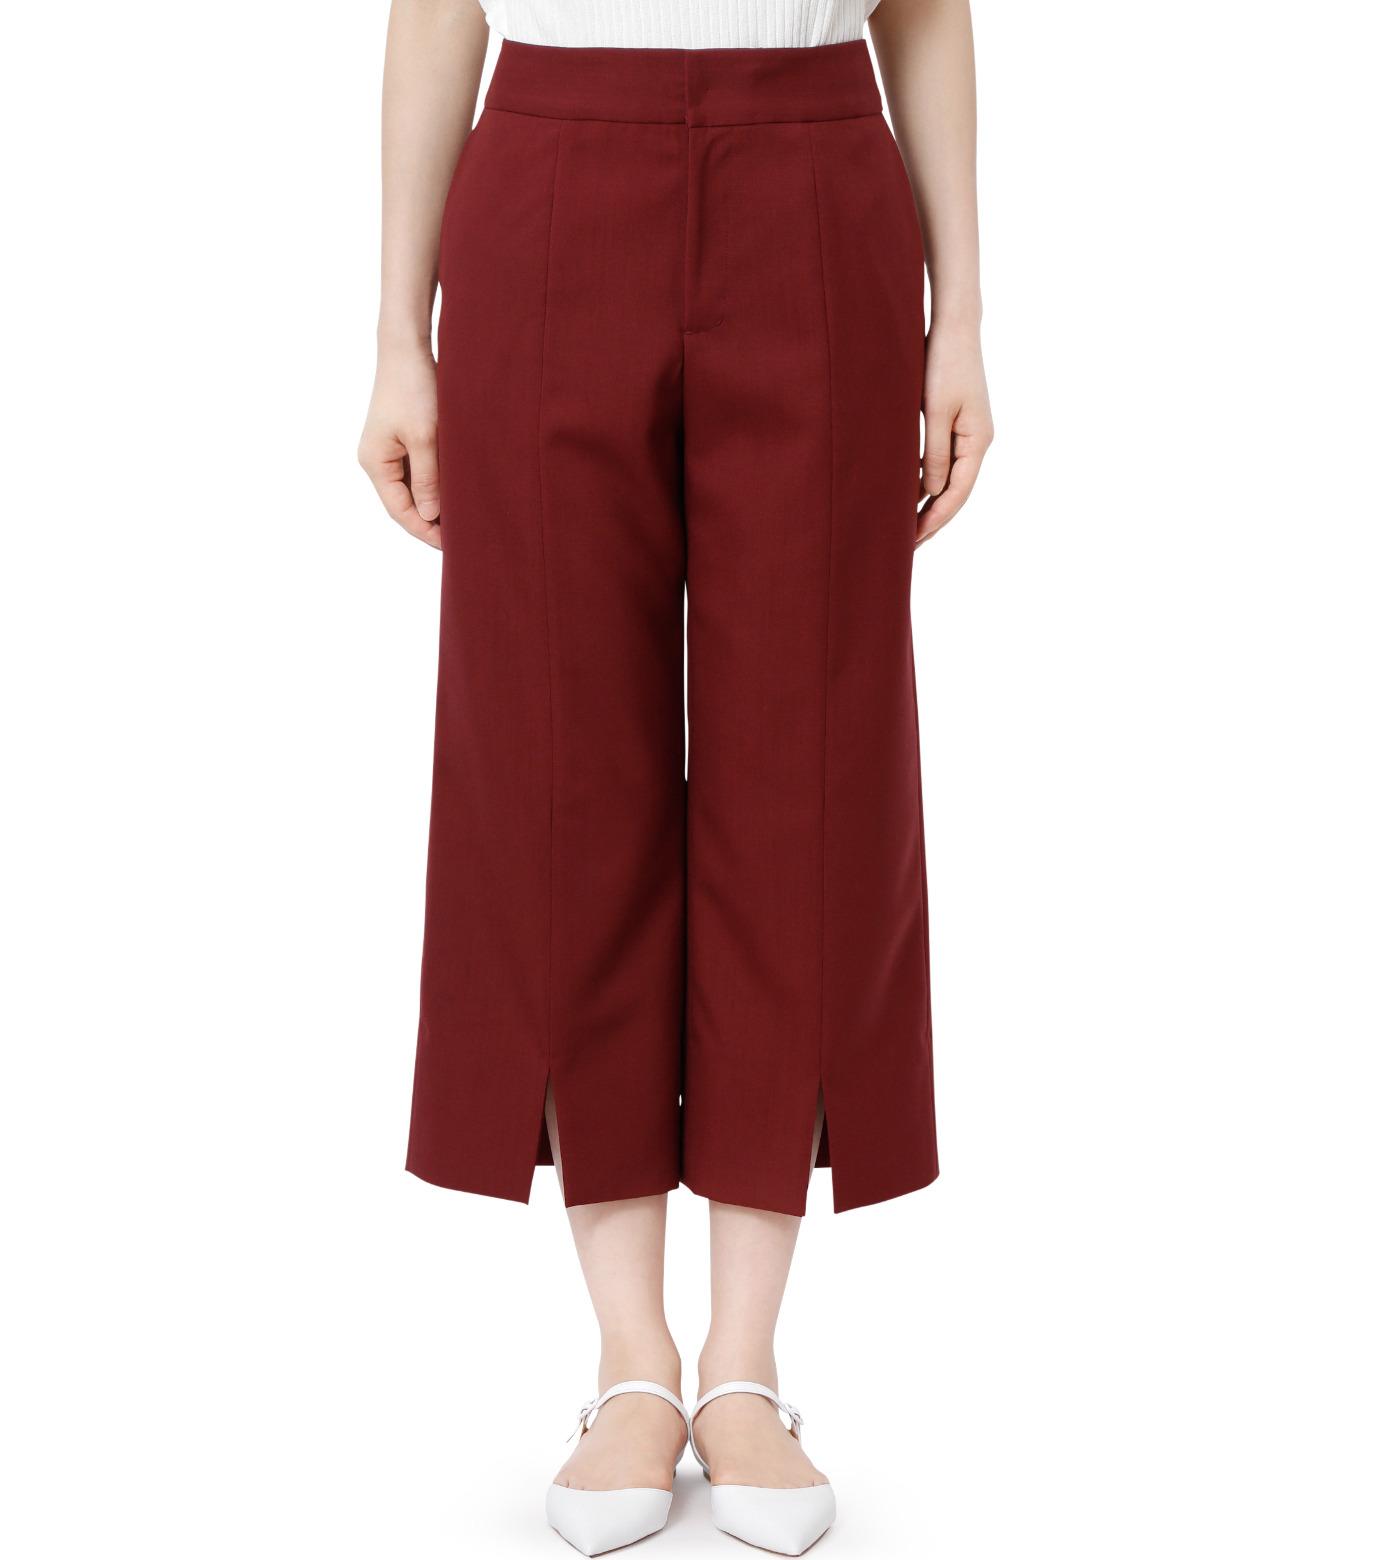 LE CIEL BLEU(ルシェルブルー)のサマーウールストレートパンツ-BORDEAUX(パンツ/pants)-18A68001 拡大詳細画像1